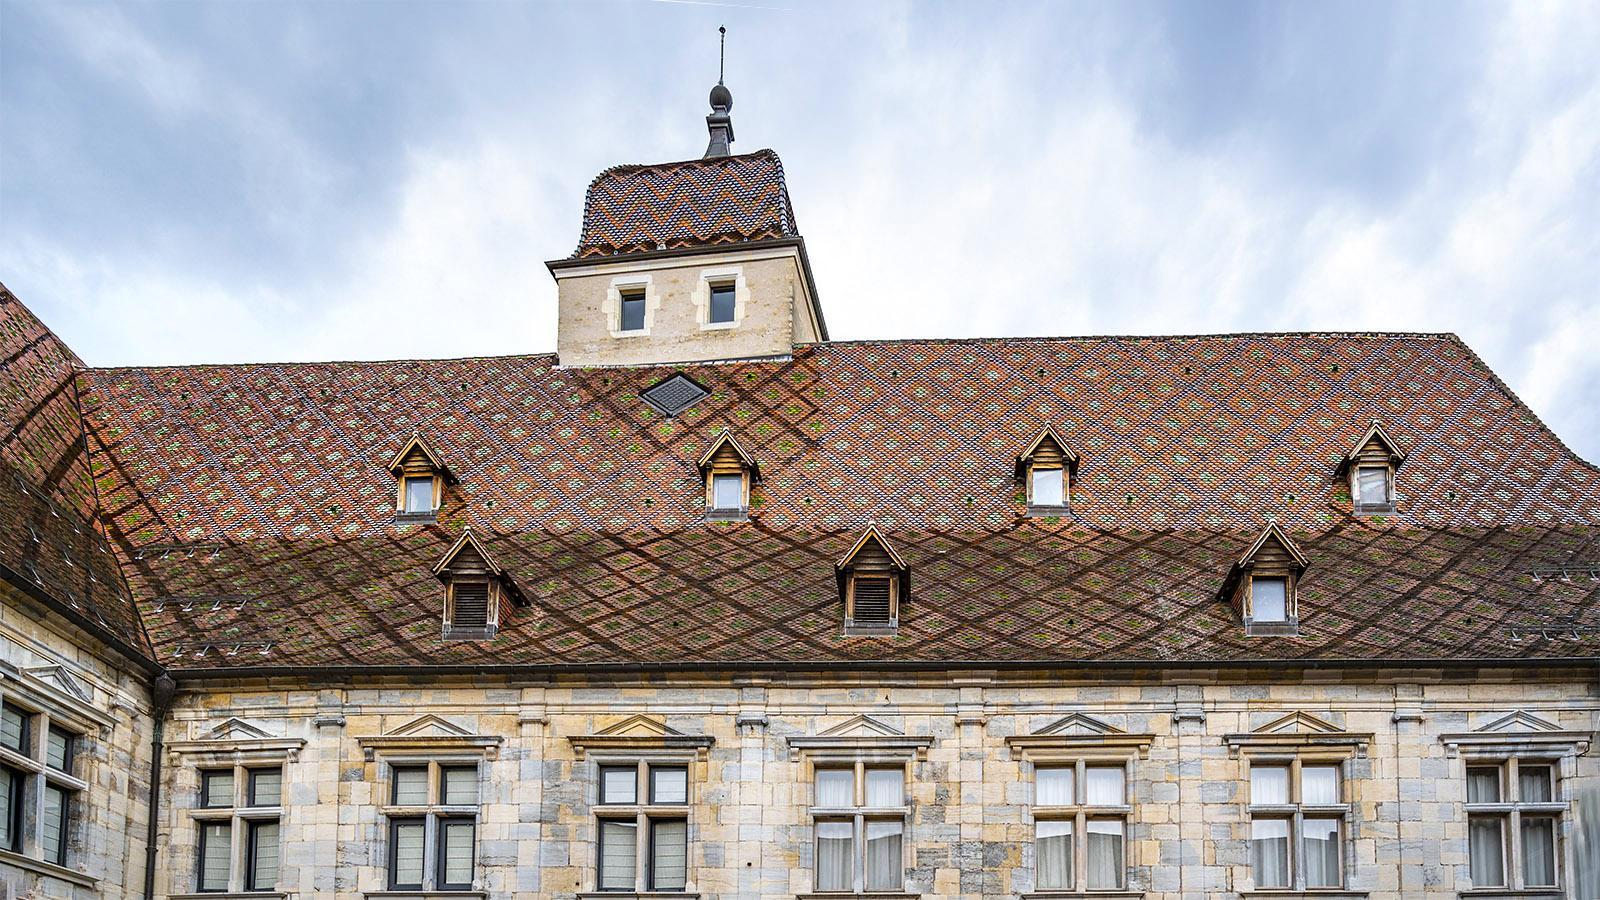 Besançon: das bunt glasierte Dach des Palais Granvelle. Foto: Hilke Maunder